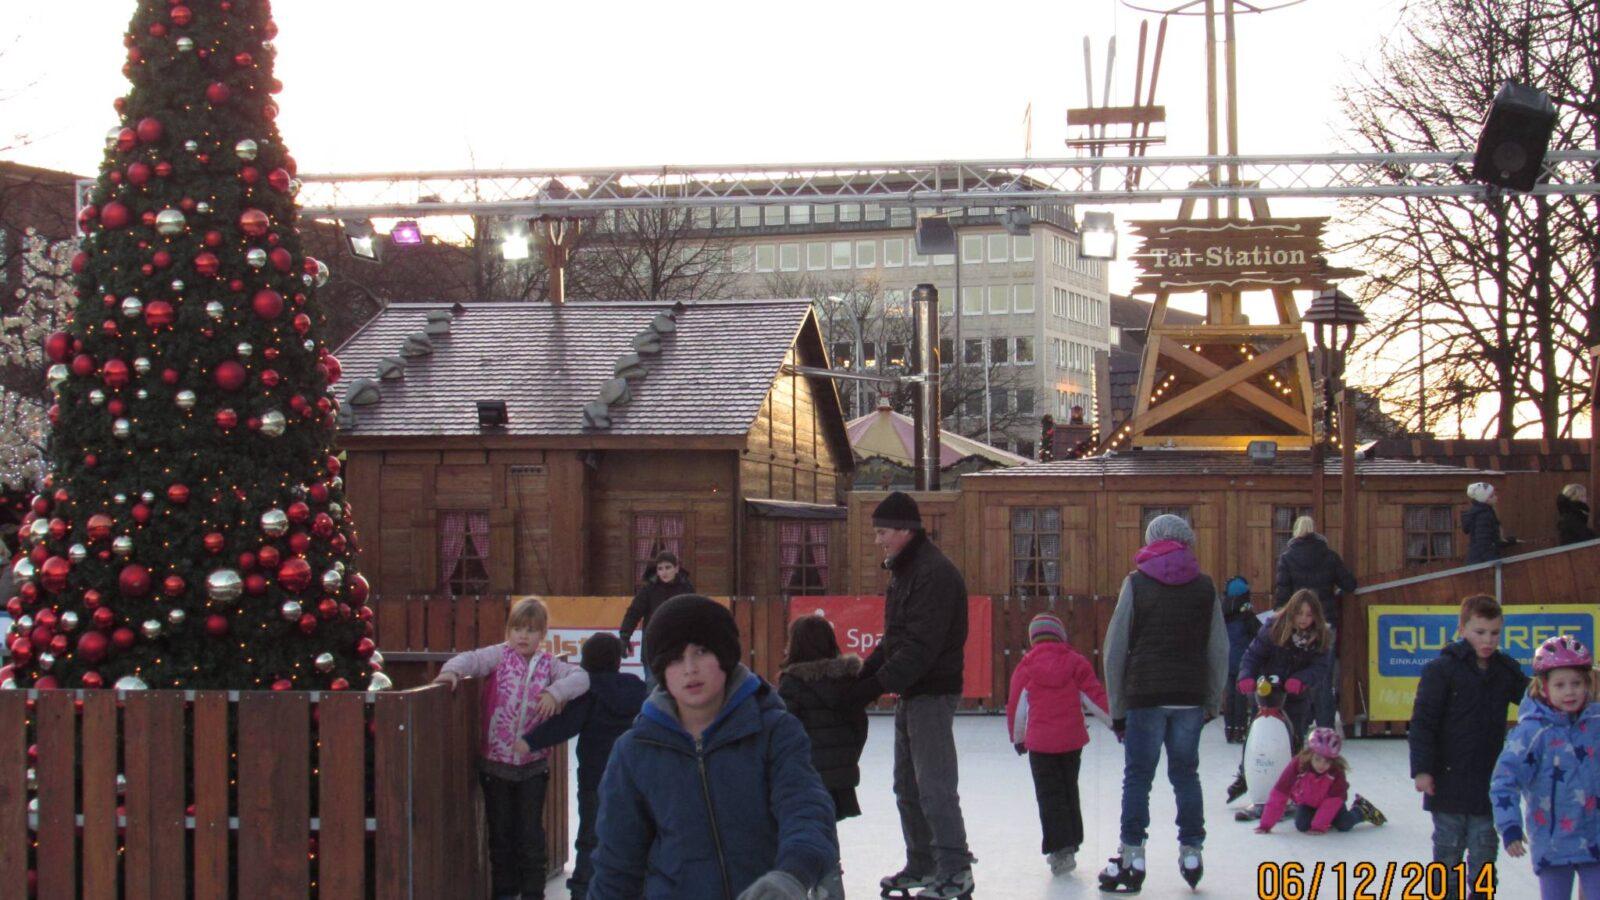 Wandsbeker Winterzauber – bis 03.01.2016 – Wandsbeker Marktplatz